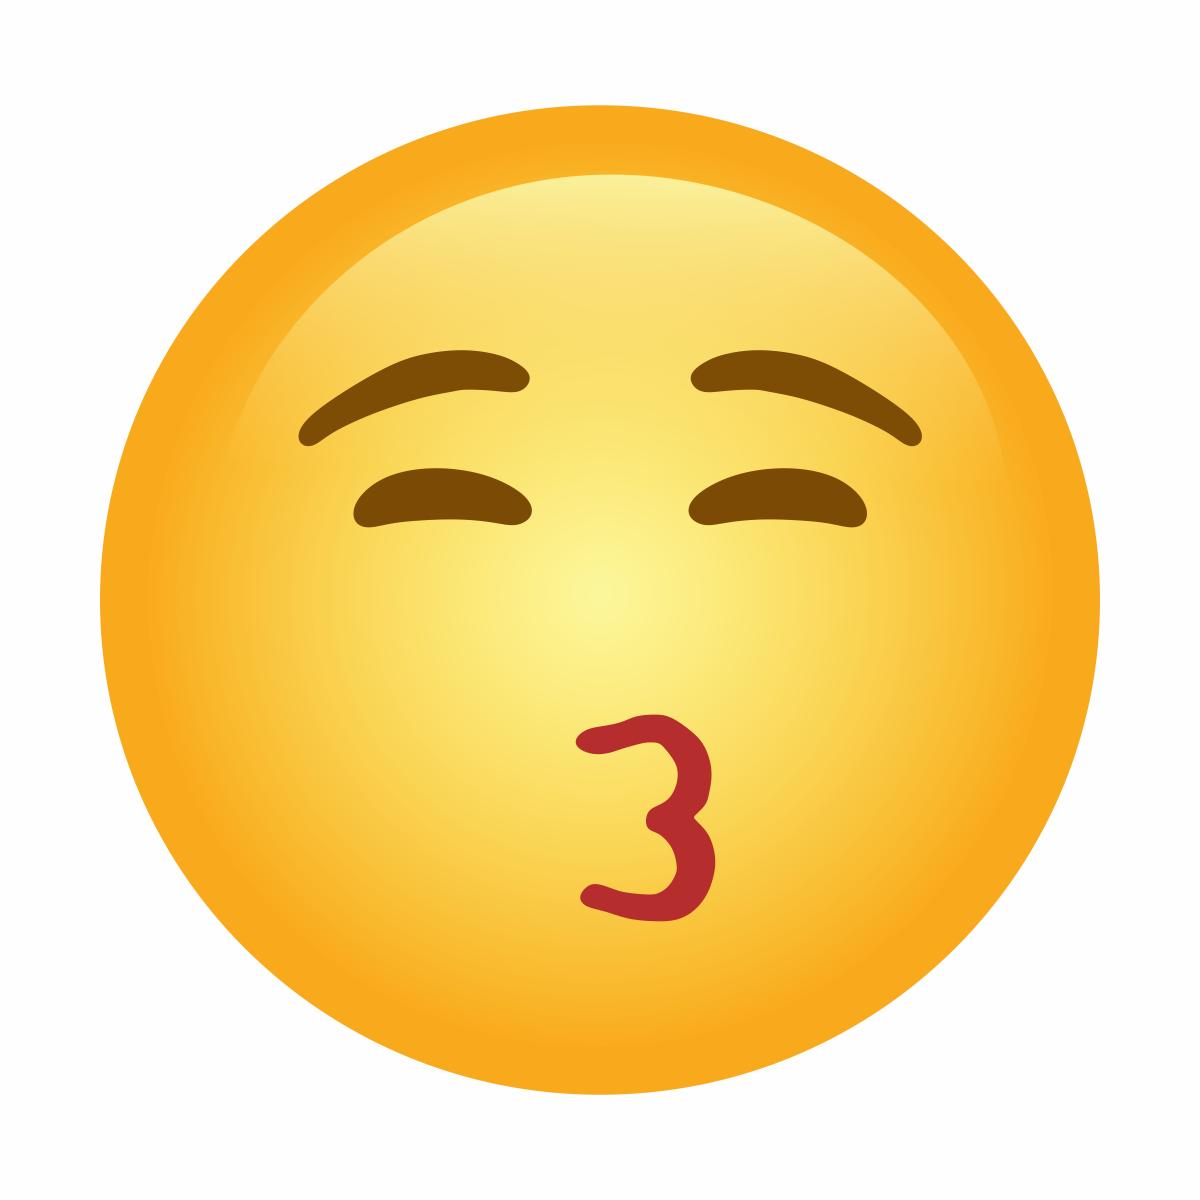 😙 - Pouting Face